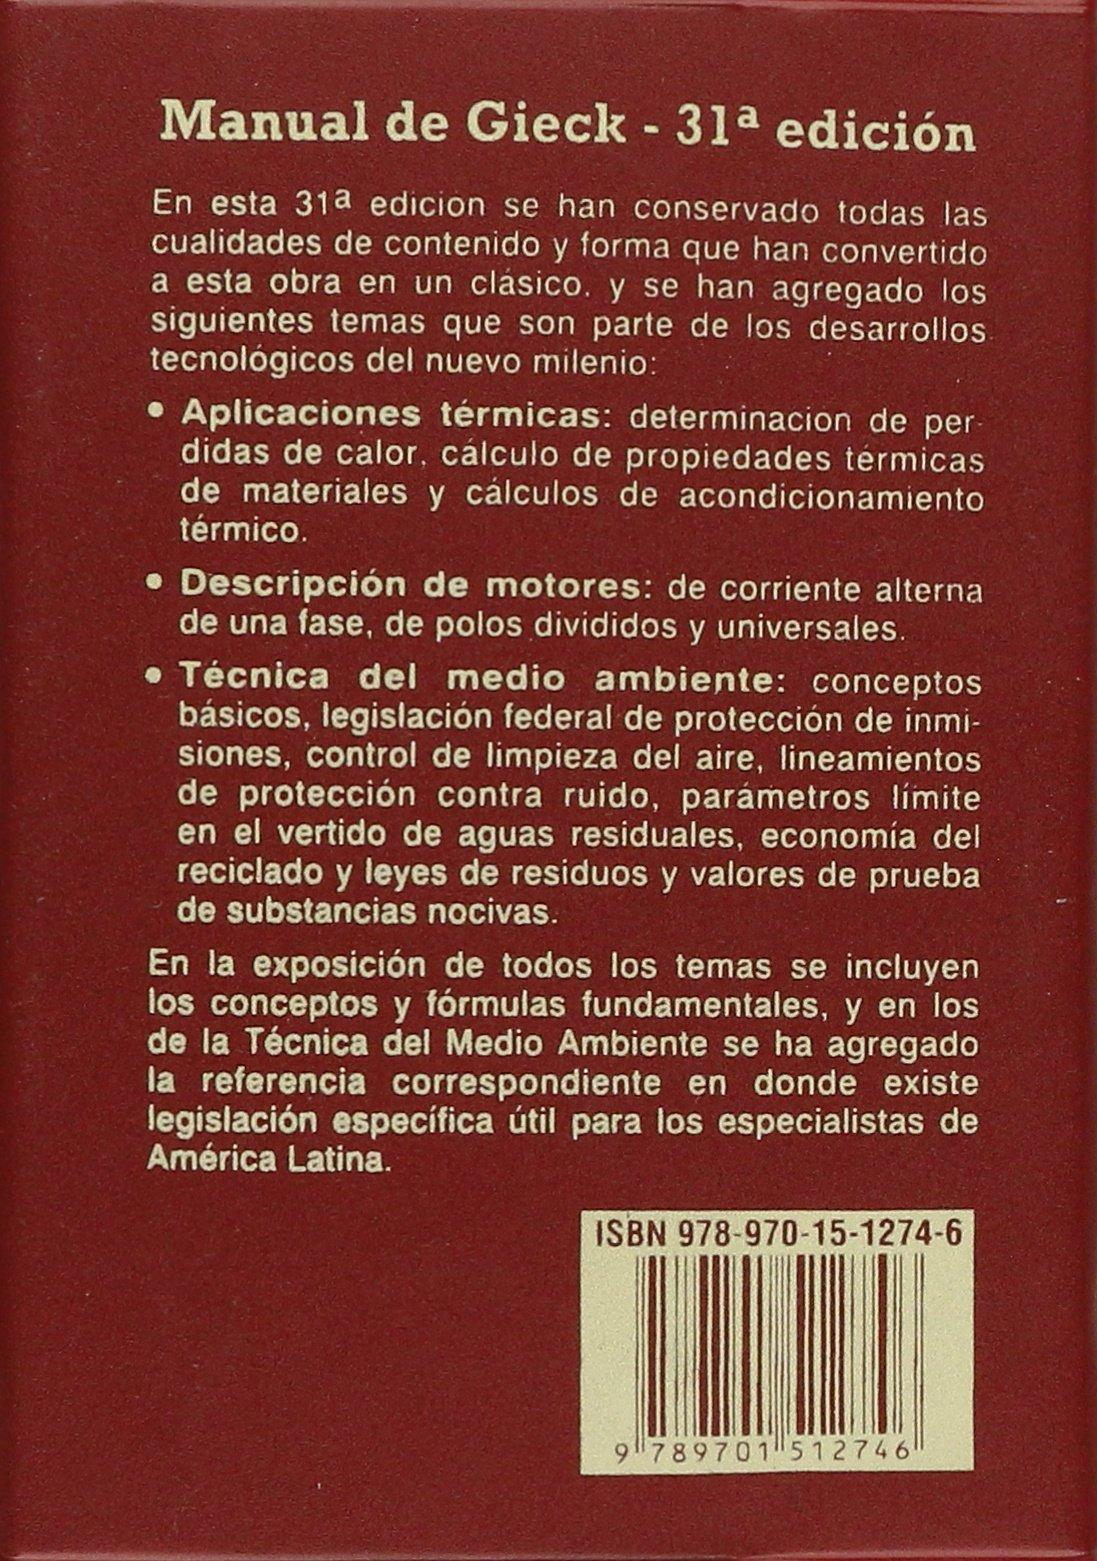 DE GIECK FORMULAS TECNICAS MANUAL BAIXAR